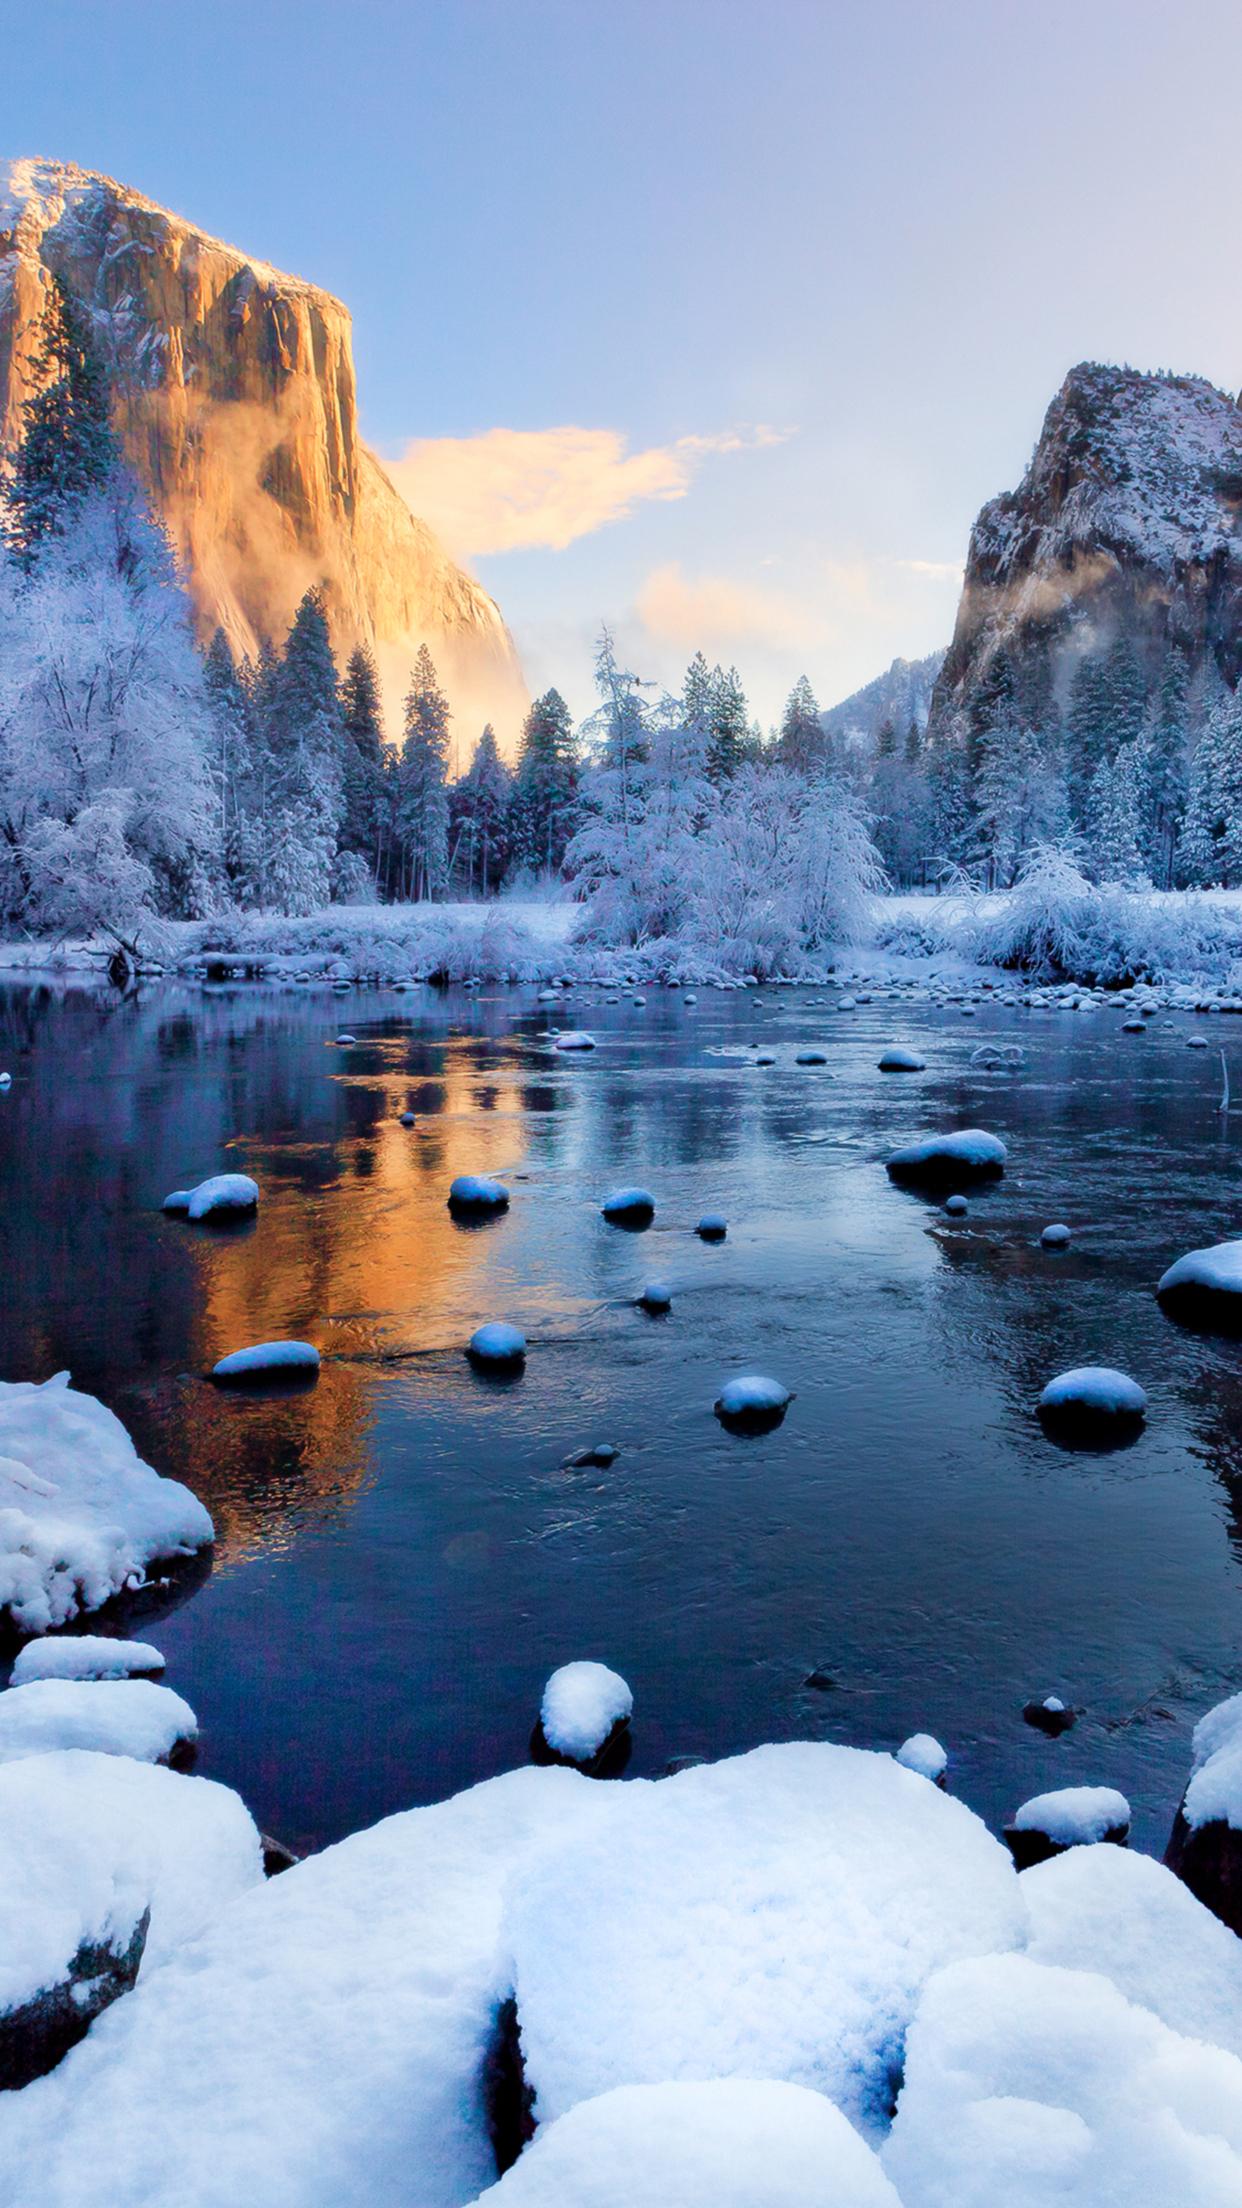 Yosemite Park 2 Wallpaper For Iphone X 8 7 6 Free